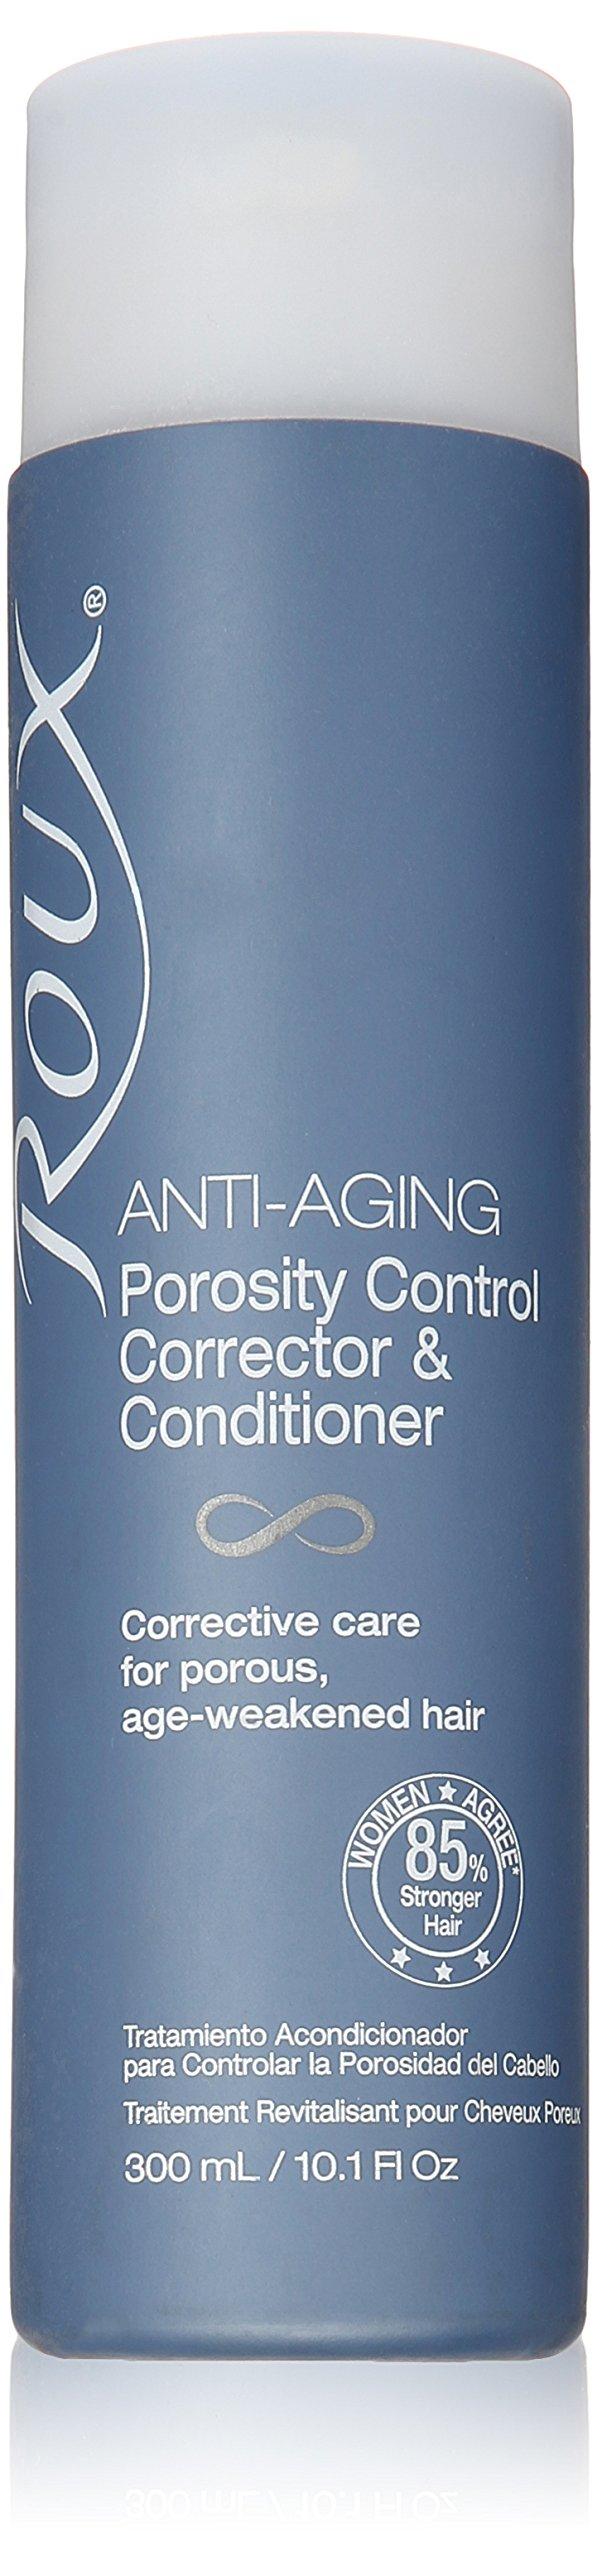 Roux Anti-aging Porosity Control Corrector & Conditioner, 10.1 Oz